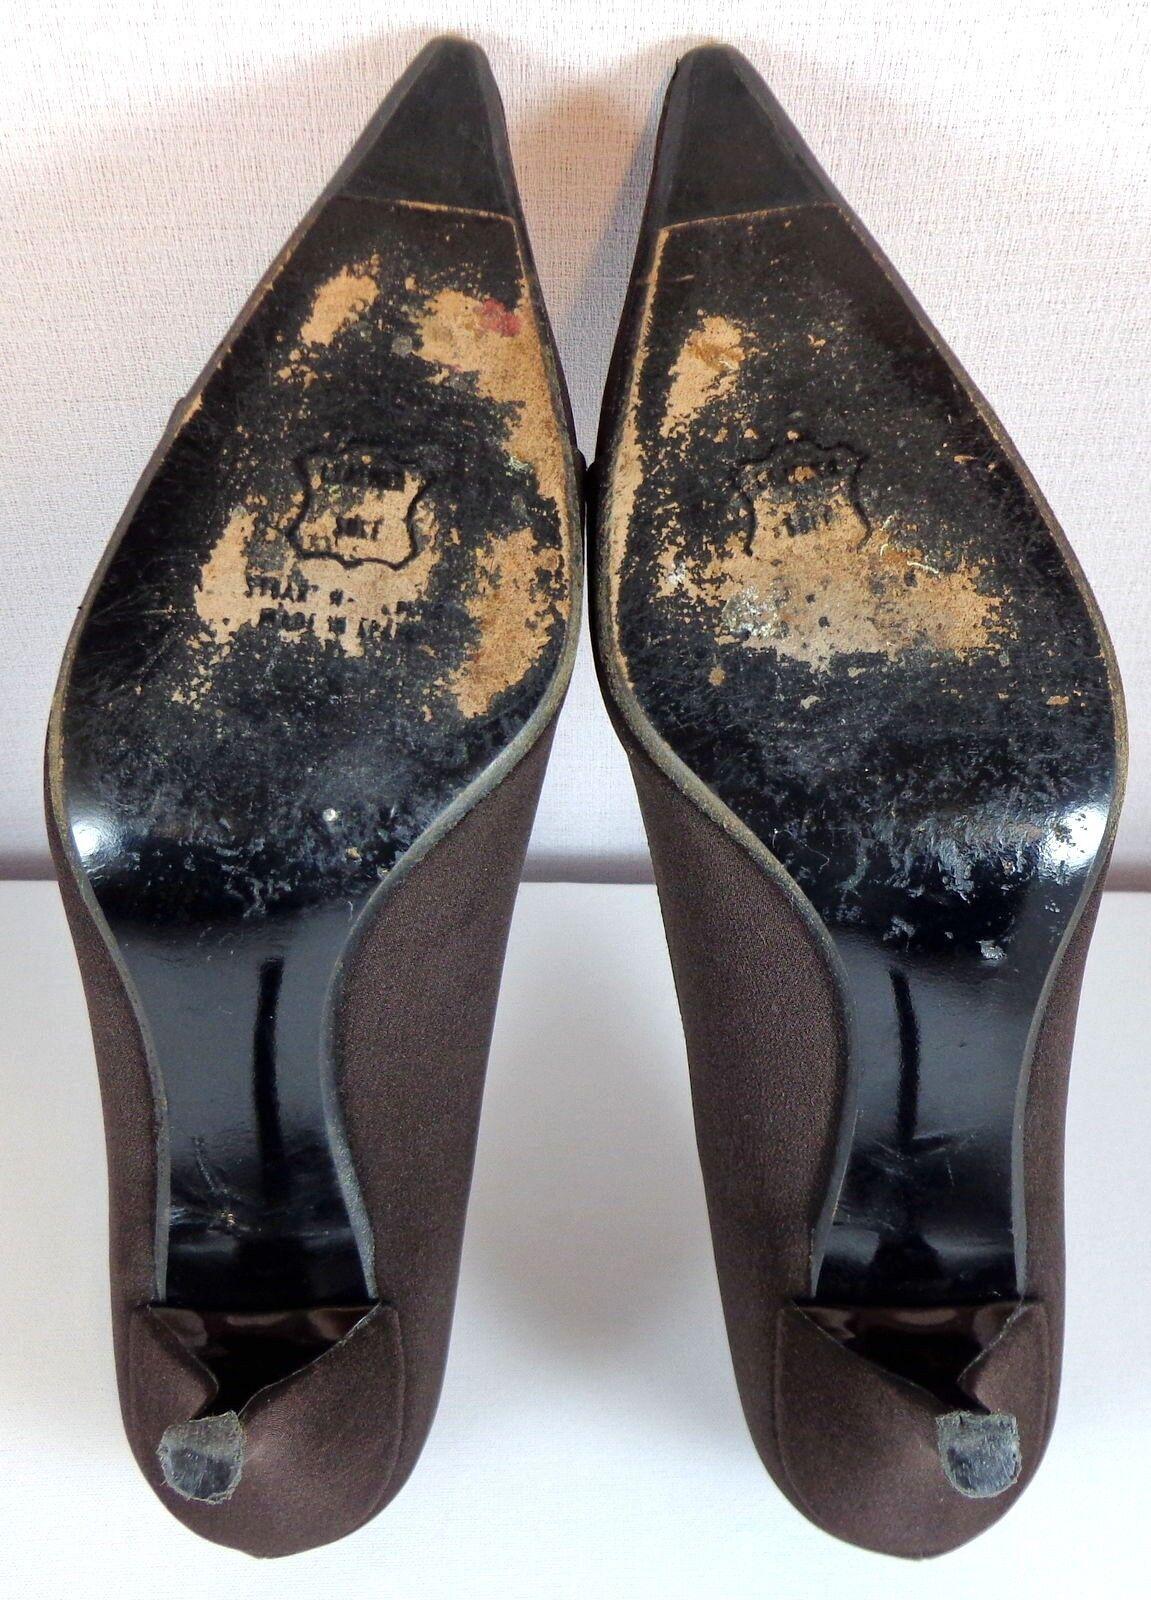 Stuart 7.5 Weitzman Damenschuhe Braun Pumps 7.5 Stuart M Schuhes Jeweled Round Embellishment d03046